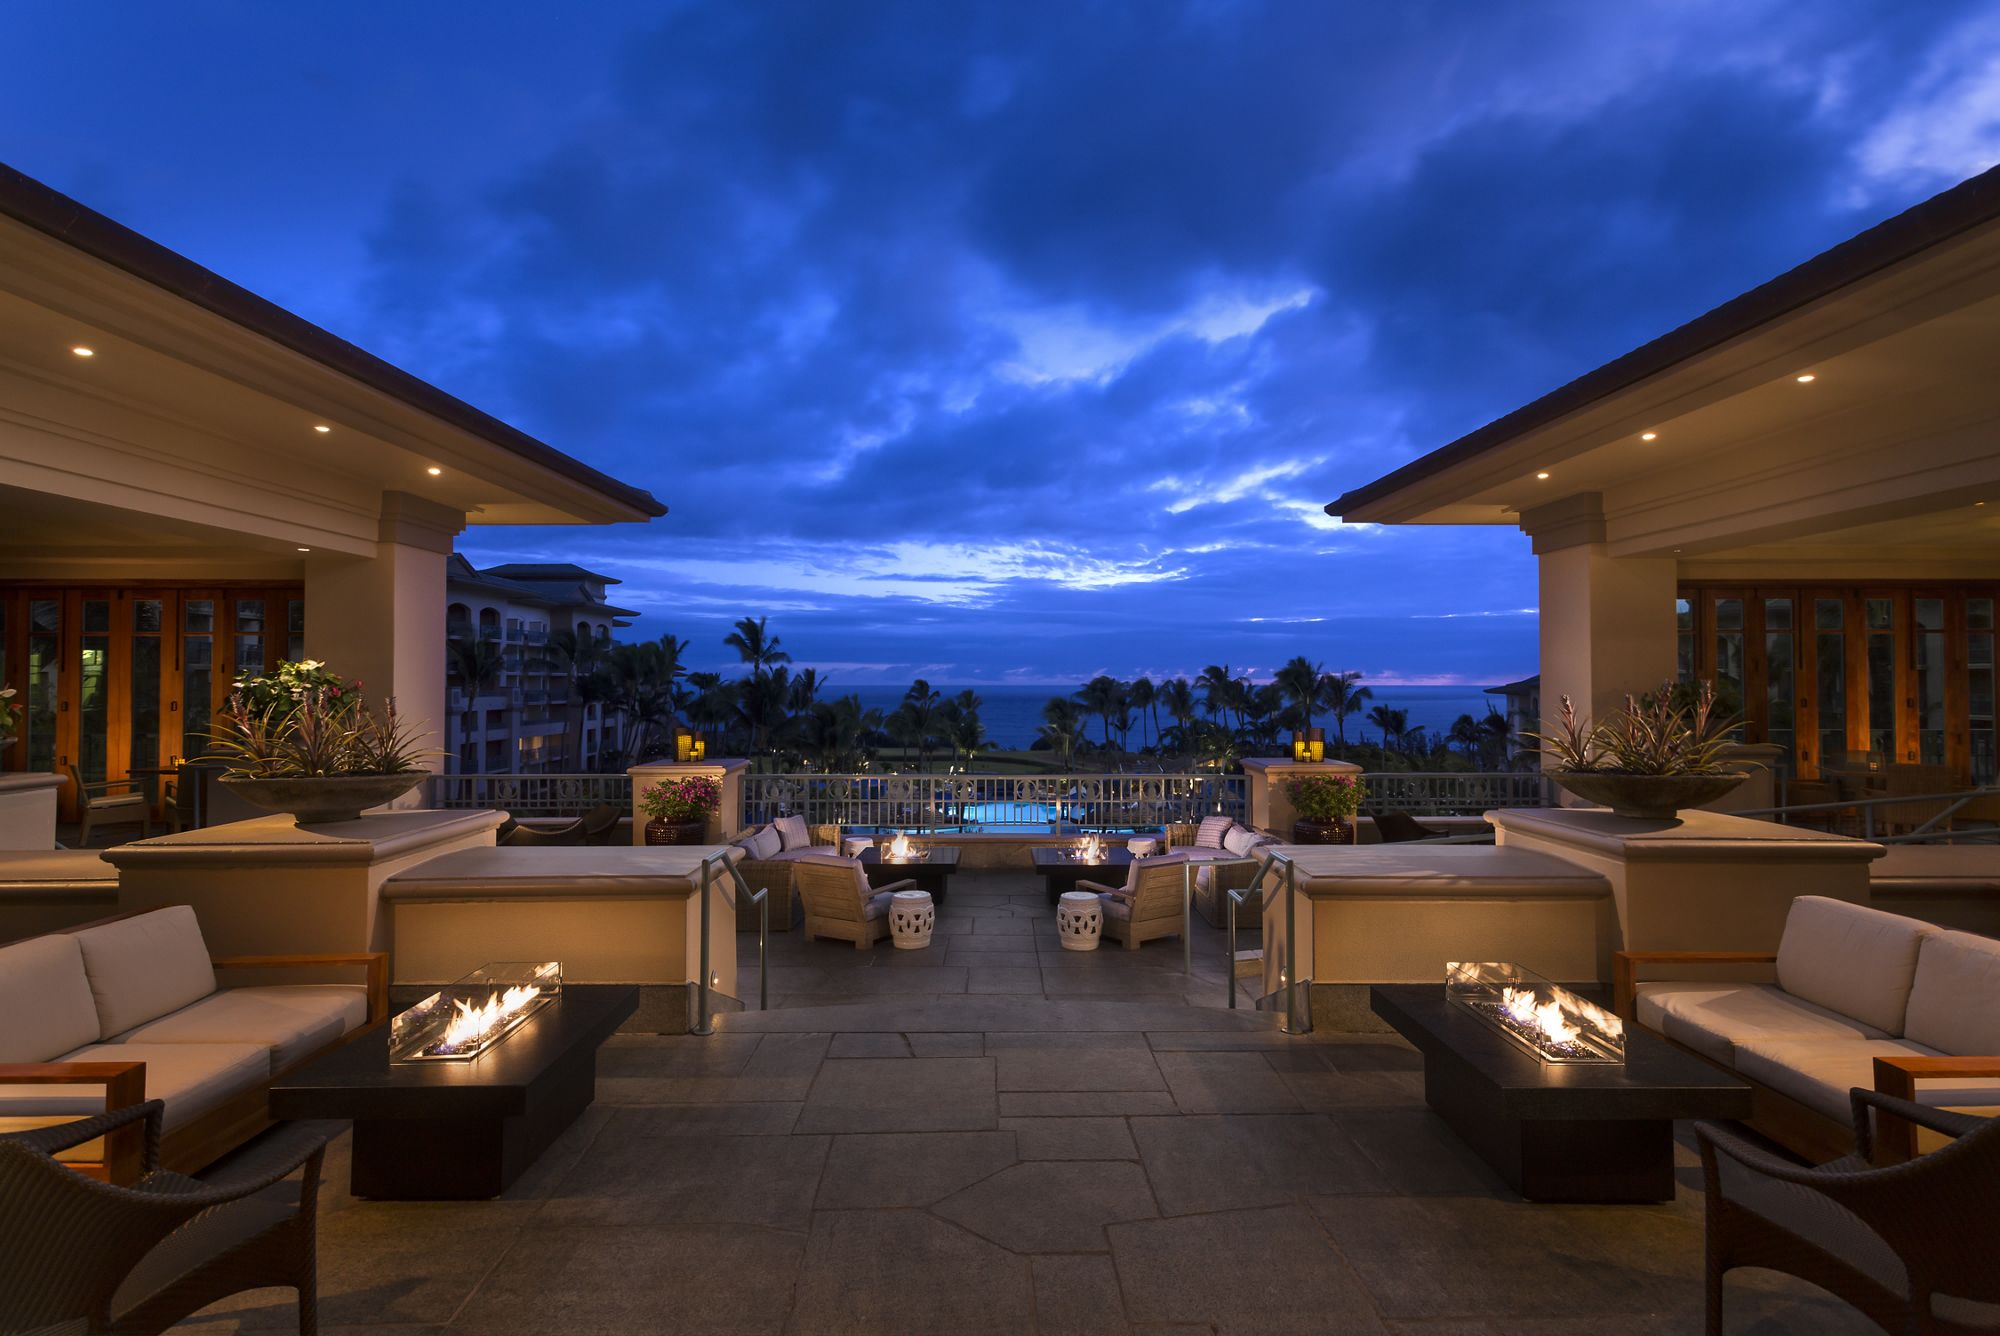 The Ritz-Carlton, Kapalua image 1